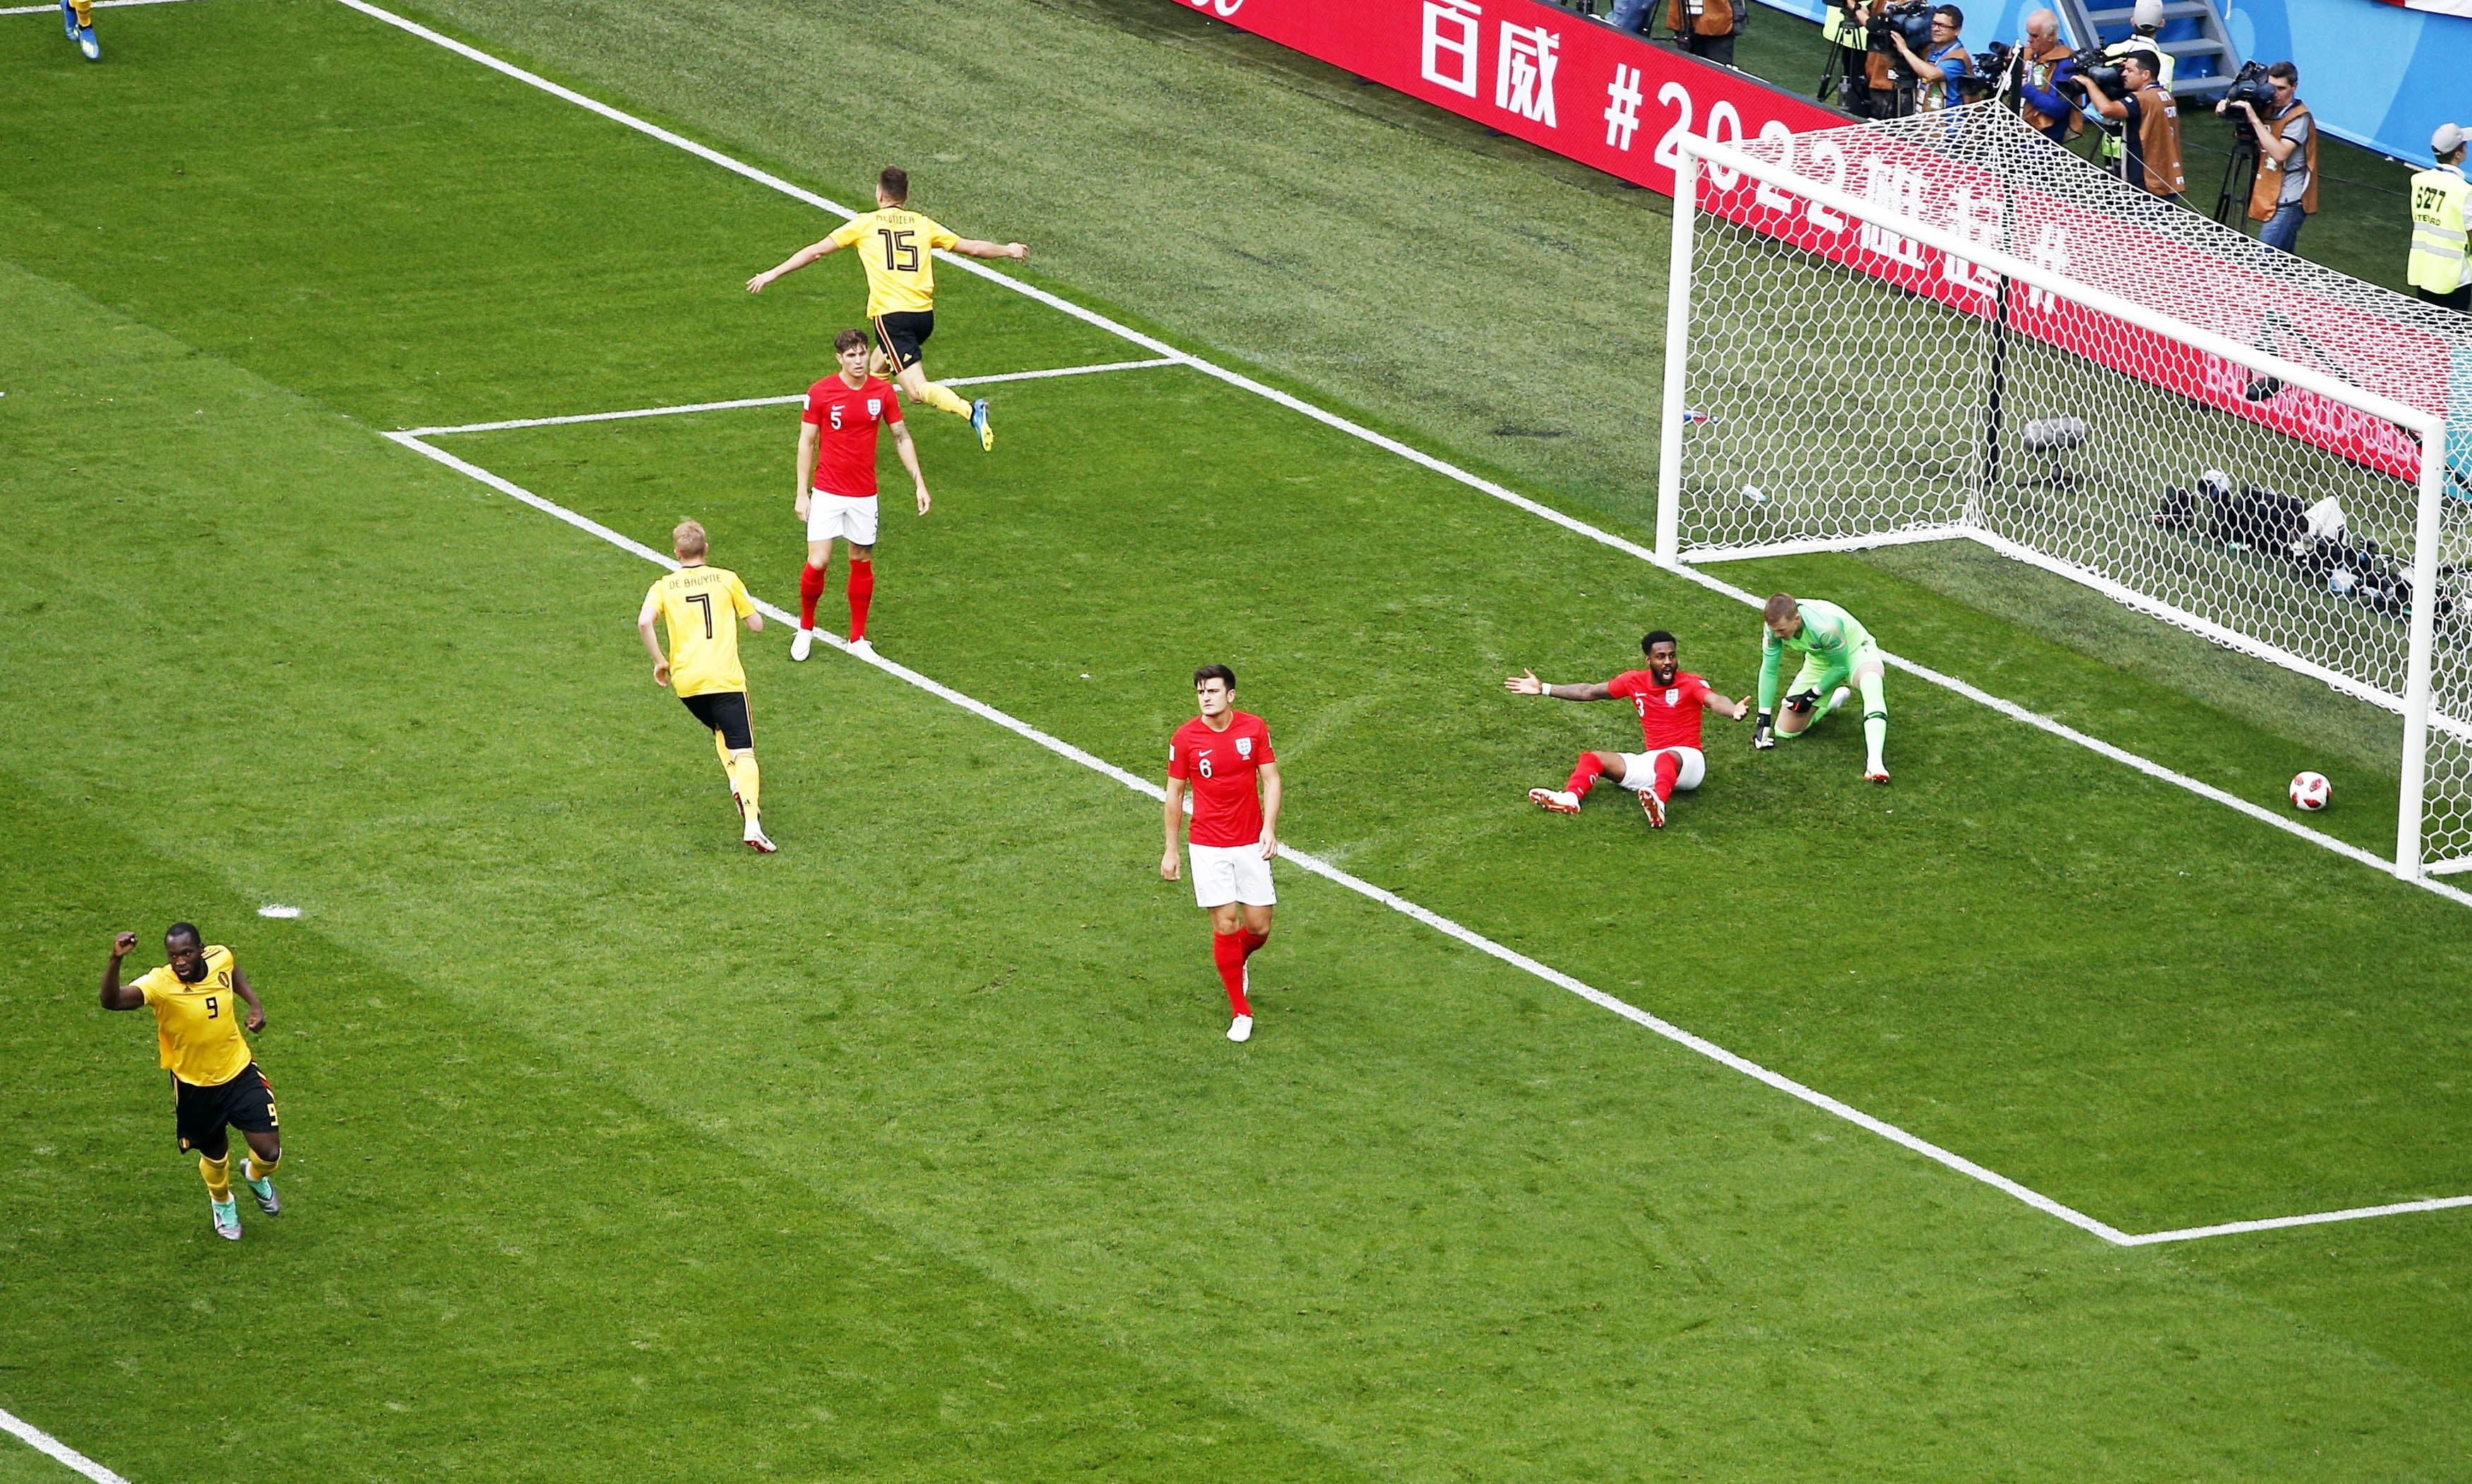 Belgium's Thomas Meunier celebrates after scoring the opening goal. —AP